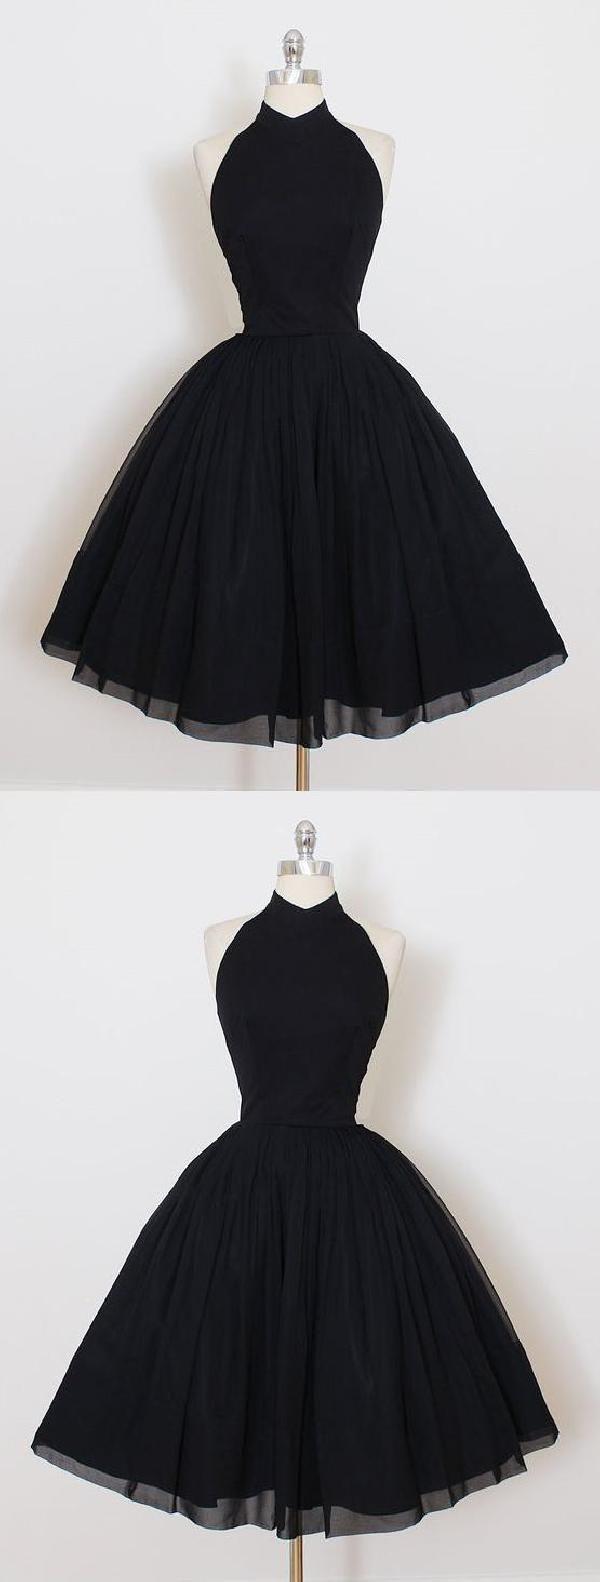 Black lace homecoming dress vneck prom dress prom dresses